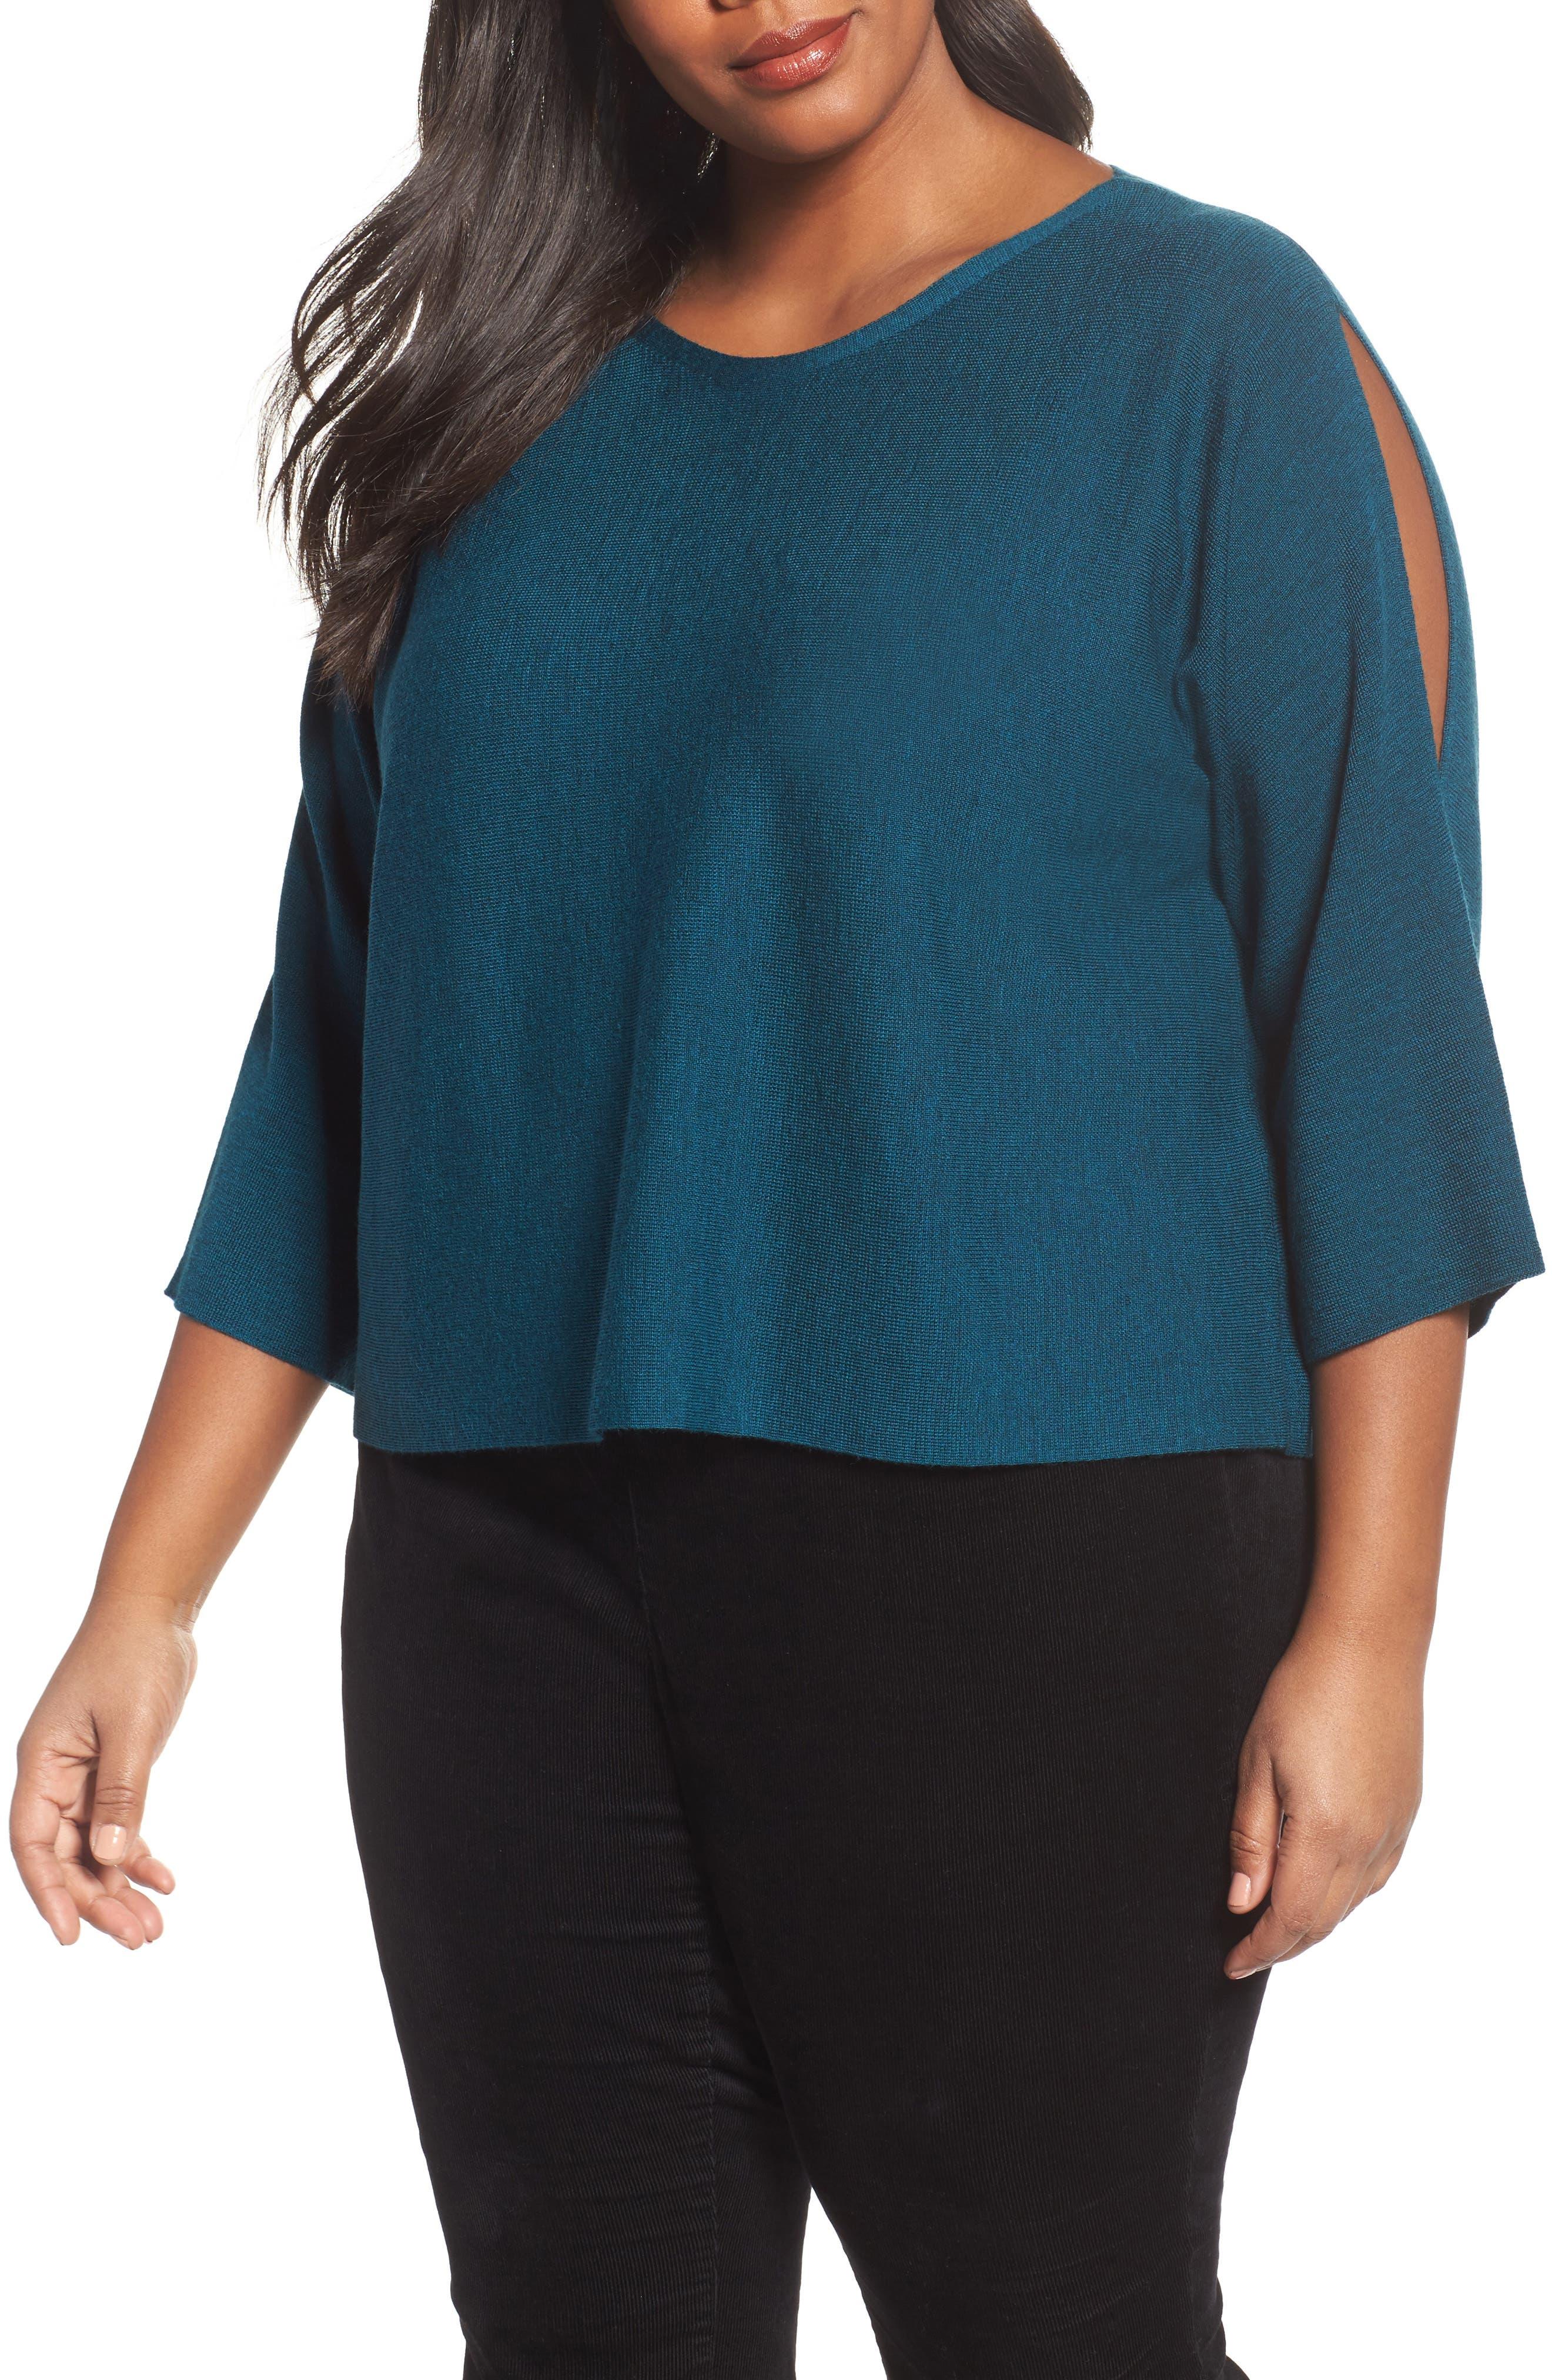 Alternate Image 1 Selected - Eileen Fisher Crop Merino Wool Sweater (Plus Size)